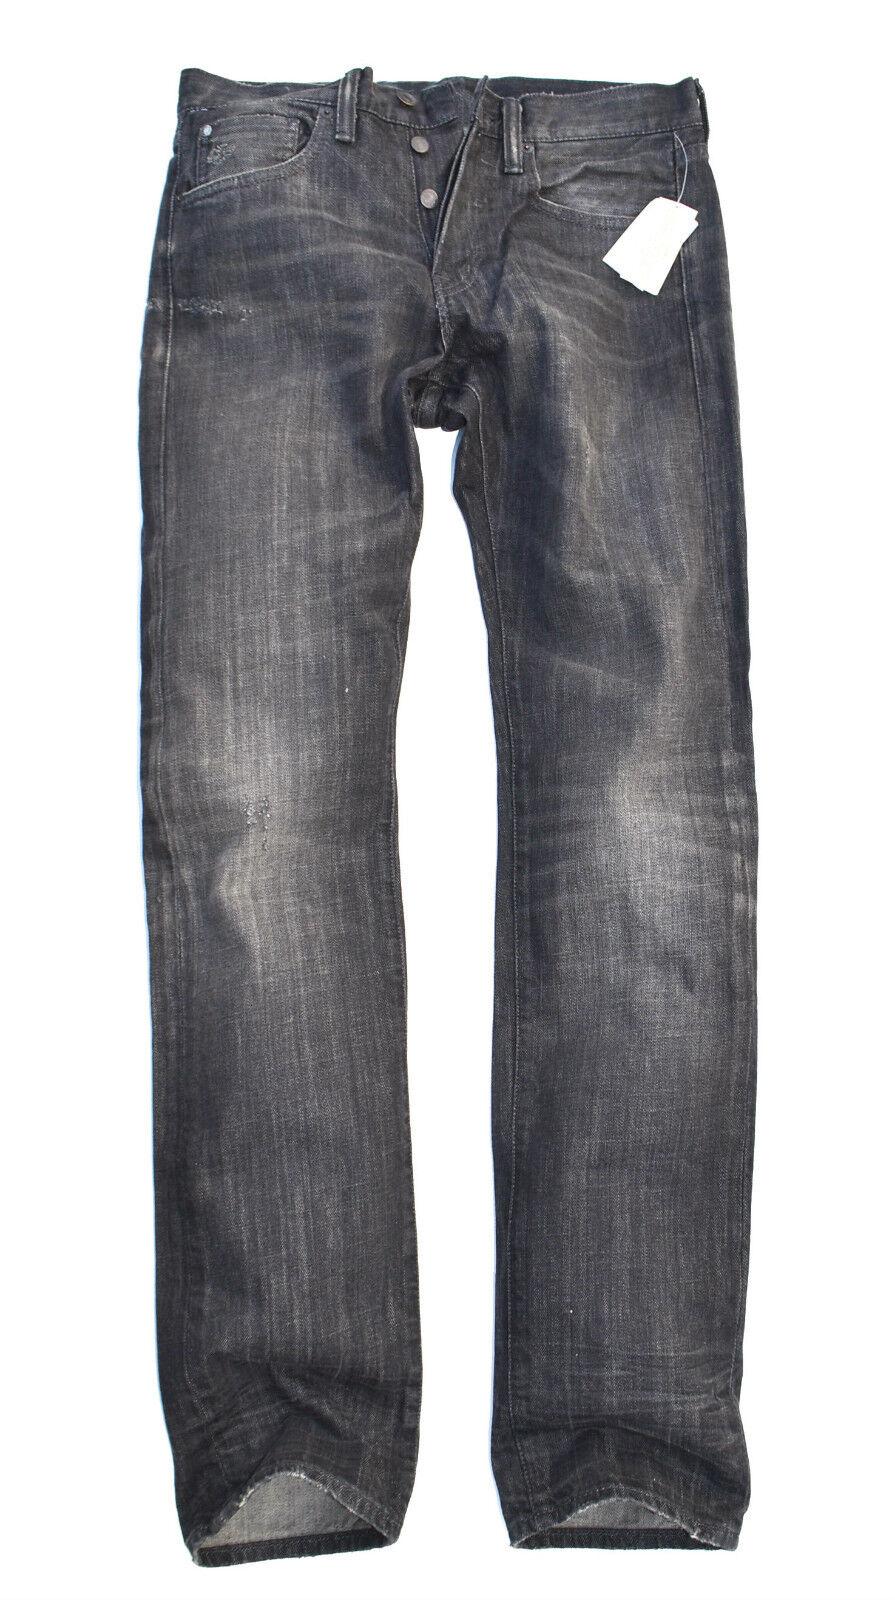 Denim & Supply Ralph Lauren Men's Straight-Fit -Lincoln Wash Jeans 12oz Size 30